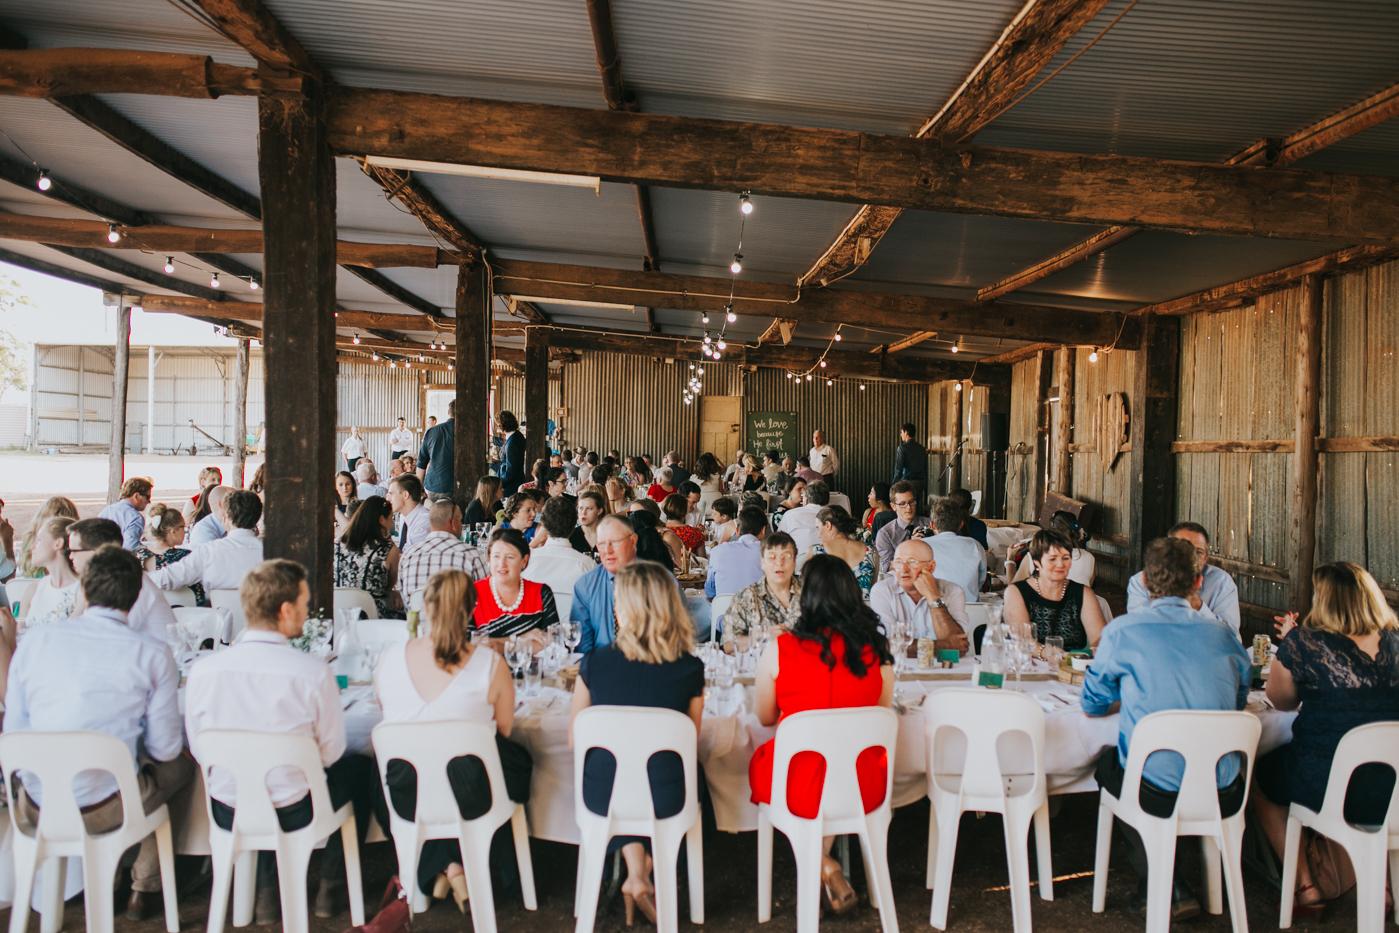 Nicolle & Jacob - Dubbo Wedding - Country Australia - Samantha Heather Photography-208.jpg